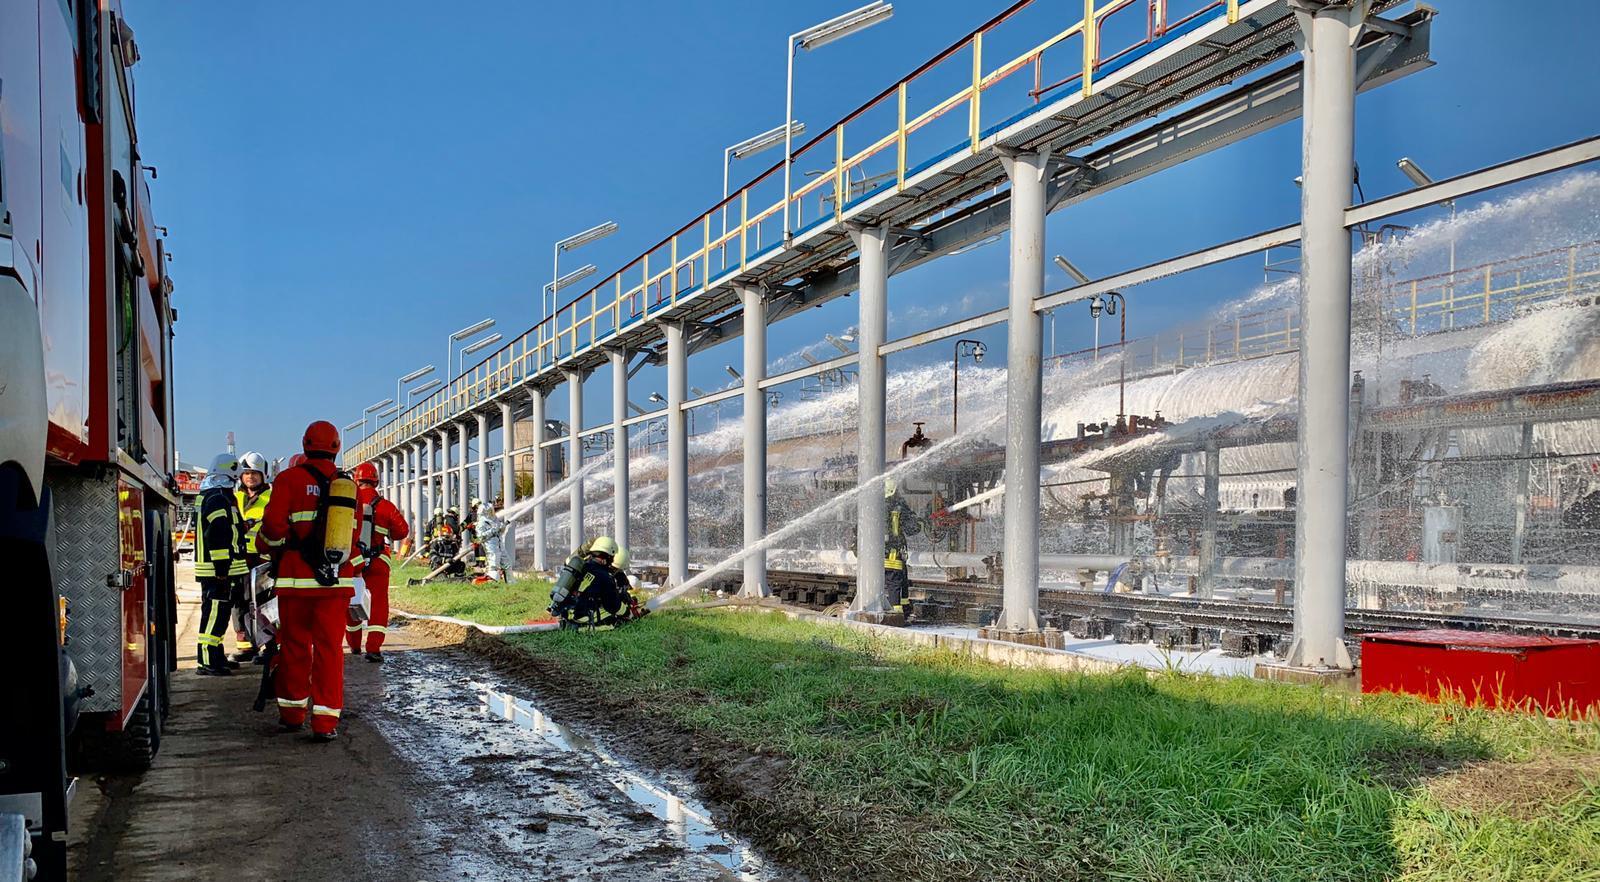 FOTO-VIDEO Simulare ISU accident la rafinăria Petrotel Lukoil